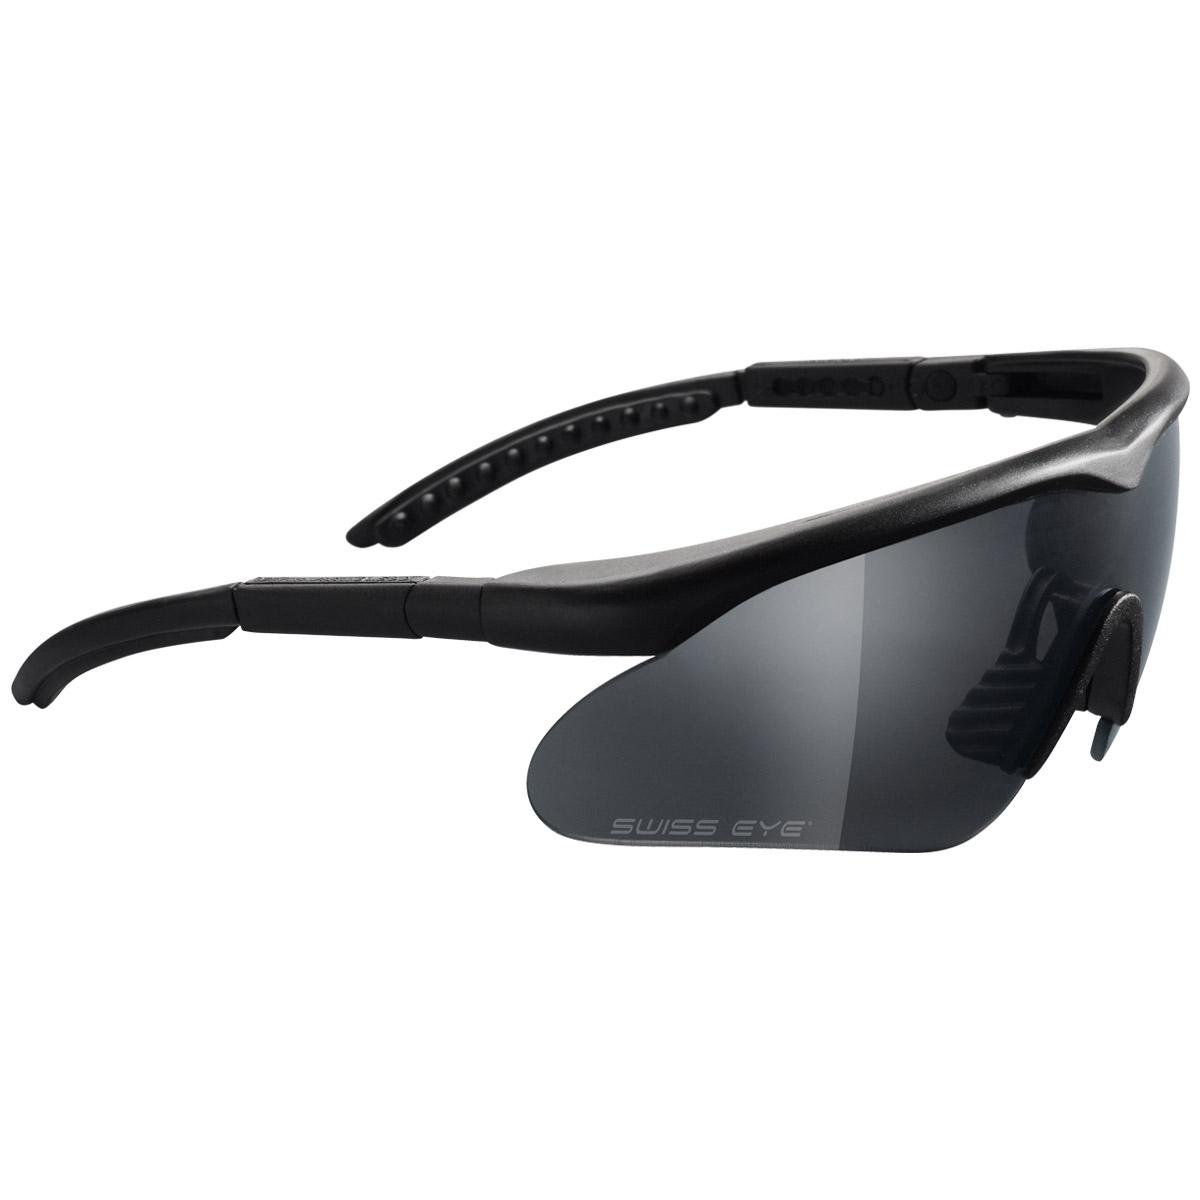 72a13933250c1 Sentinel Swiss Eye Shooting Sunglasses Ballistic Army Tactical Military  Glasses 3 Lenses